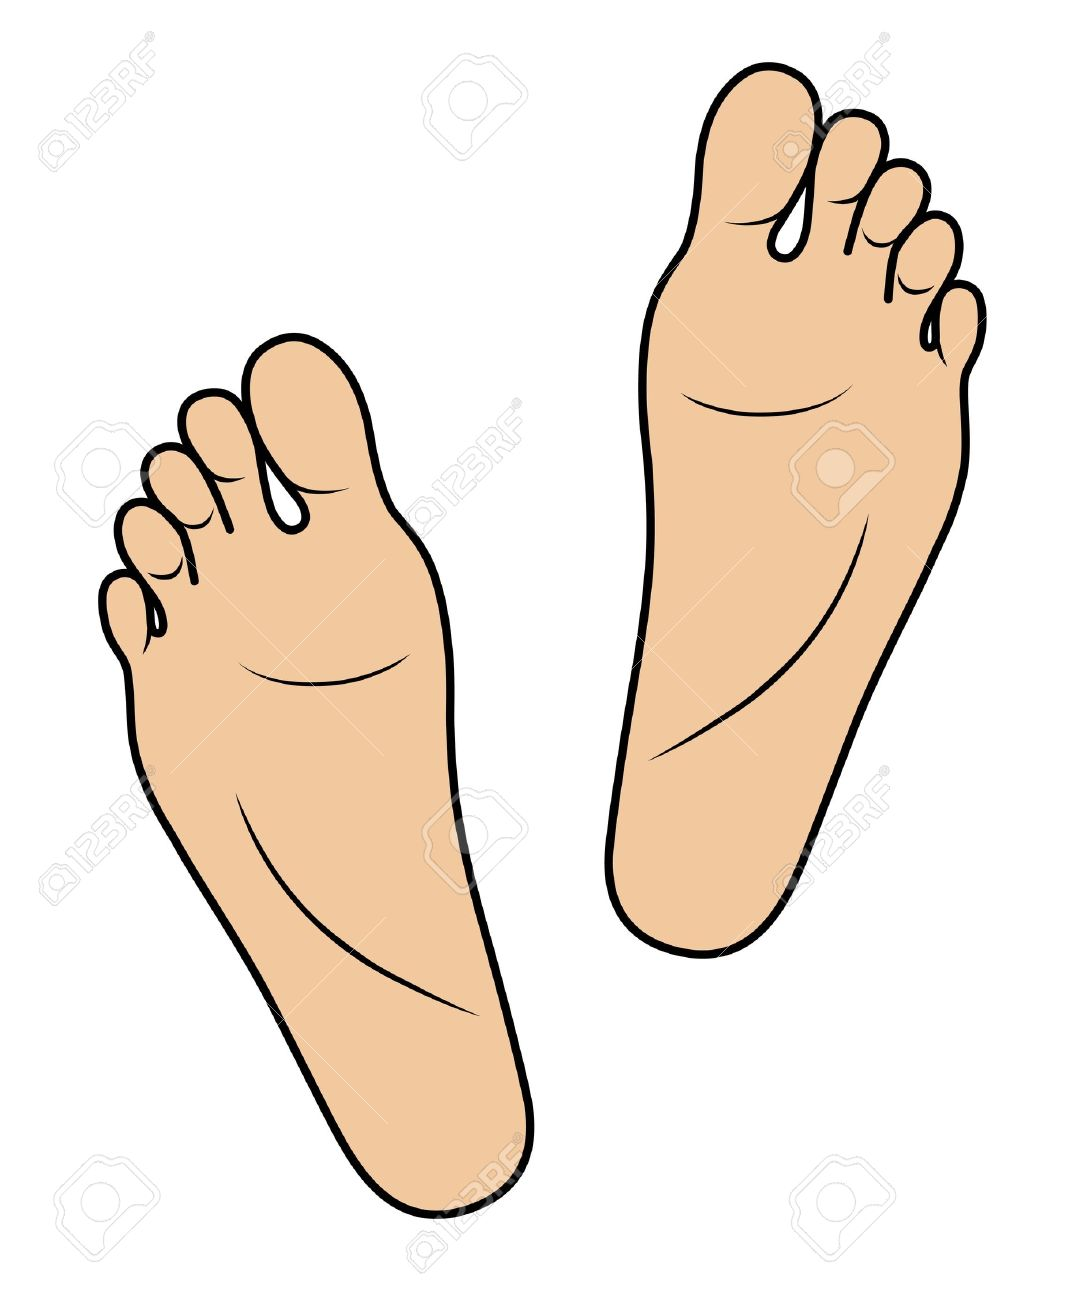 1074x1300 Cartoon Foot Clipart Foot Clipart